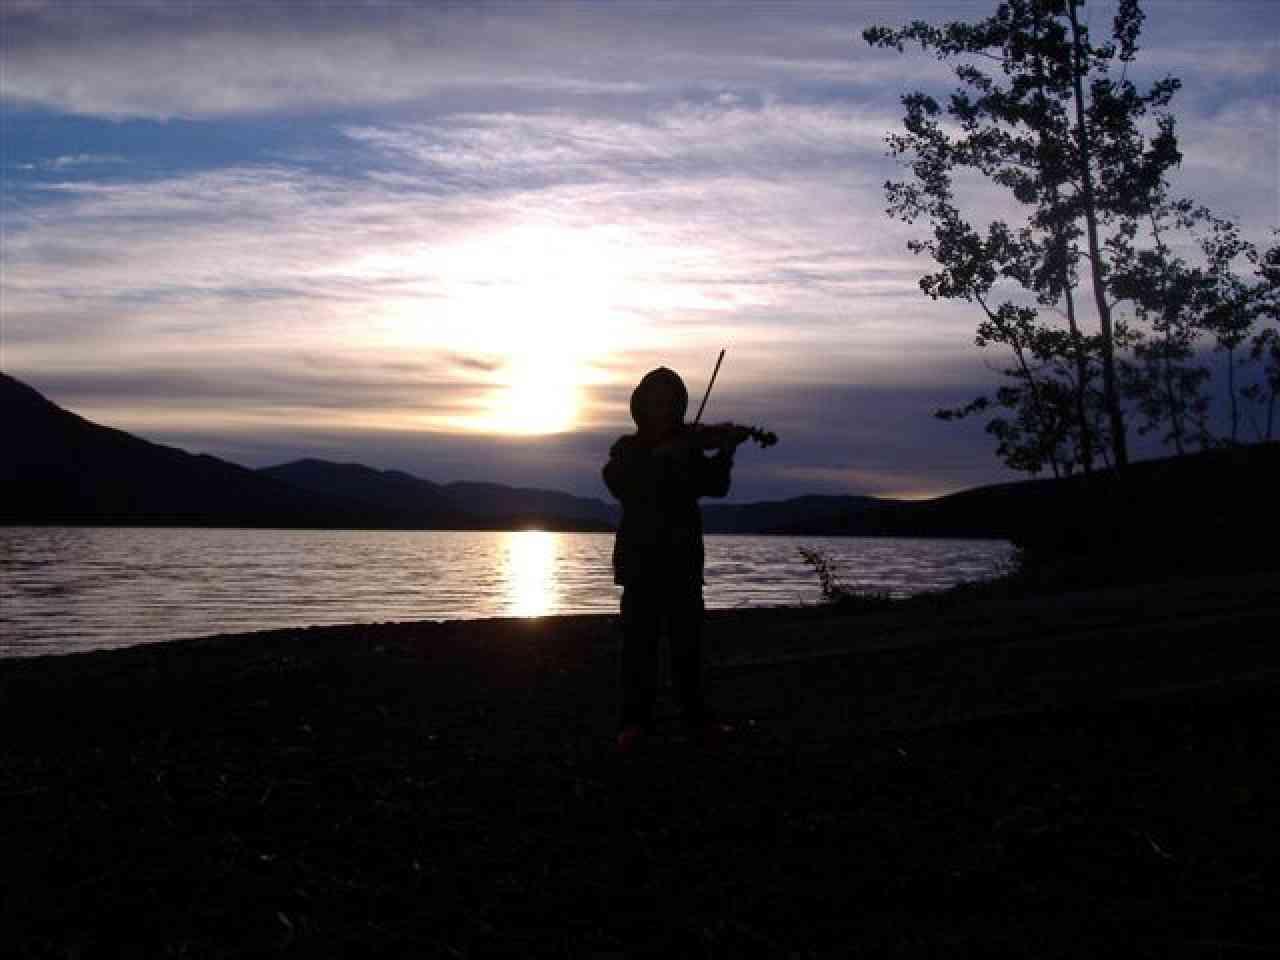 Student of the Suzuki Strings Association of the Yukon